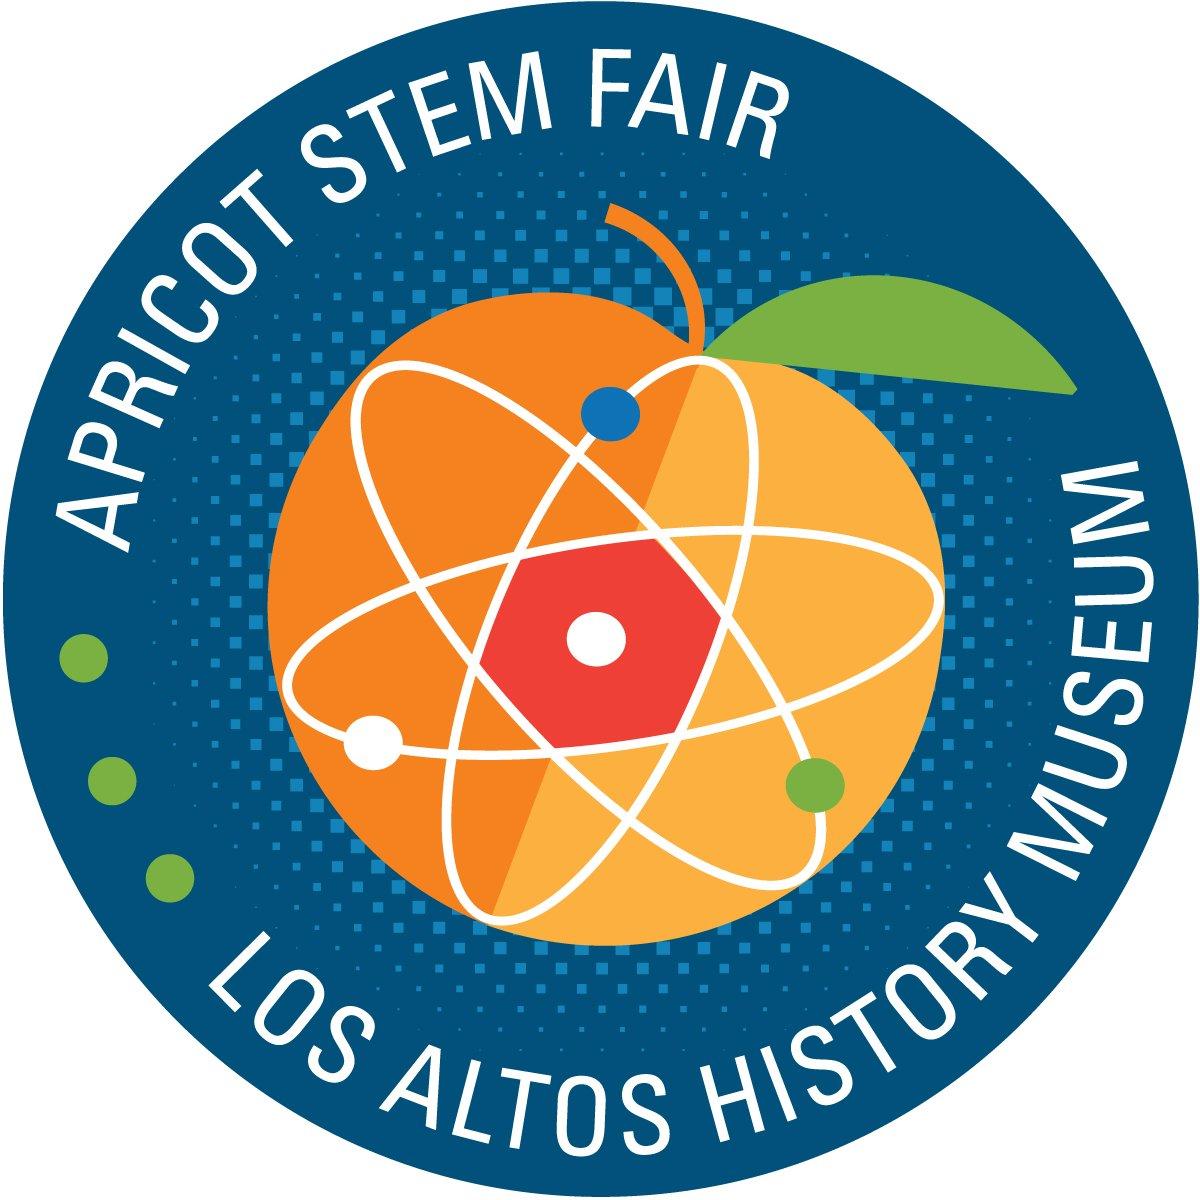 Apricot STEM Fair